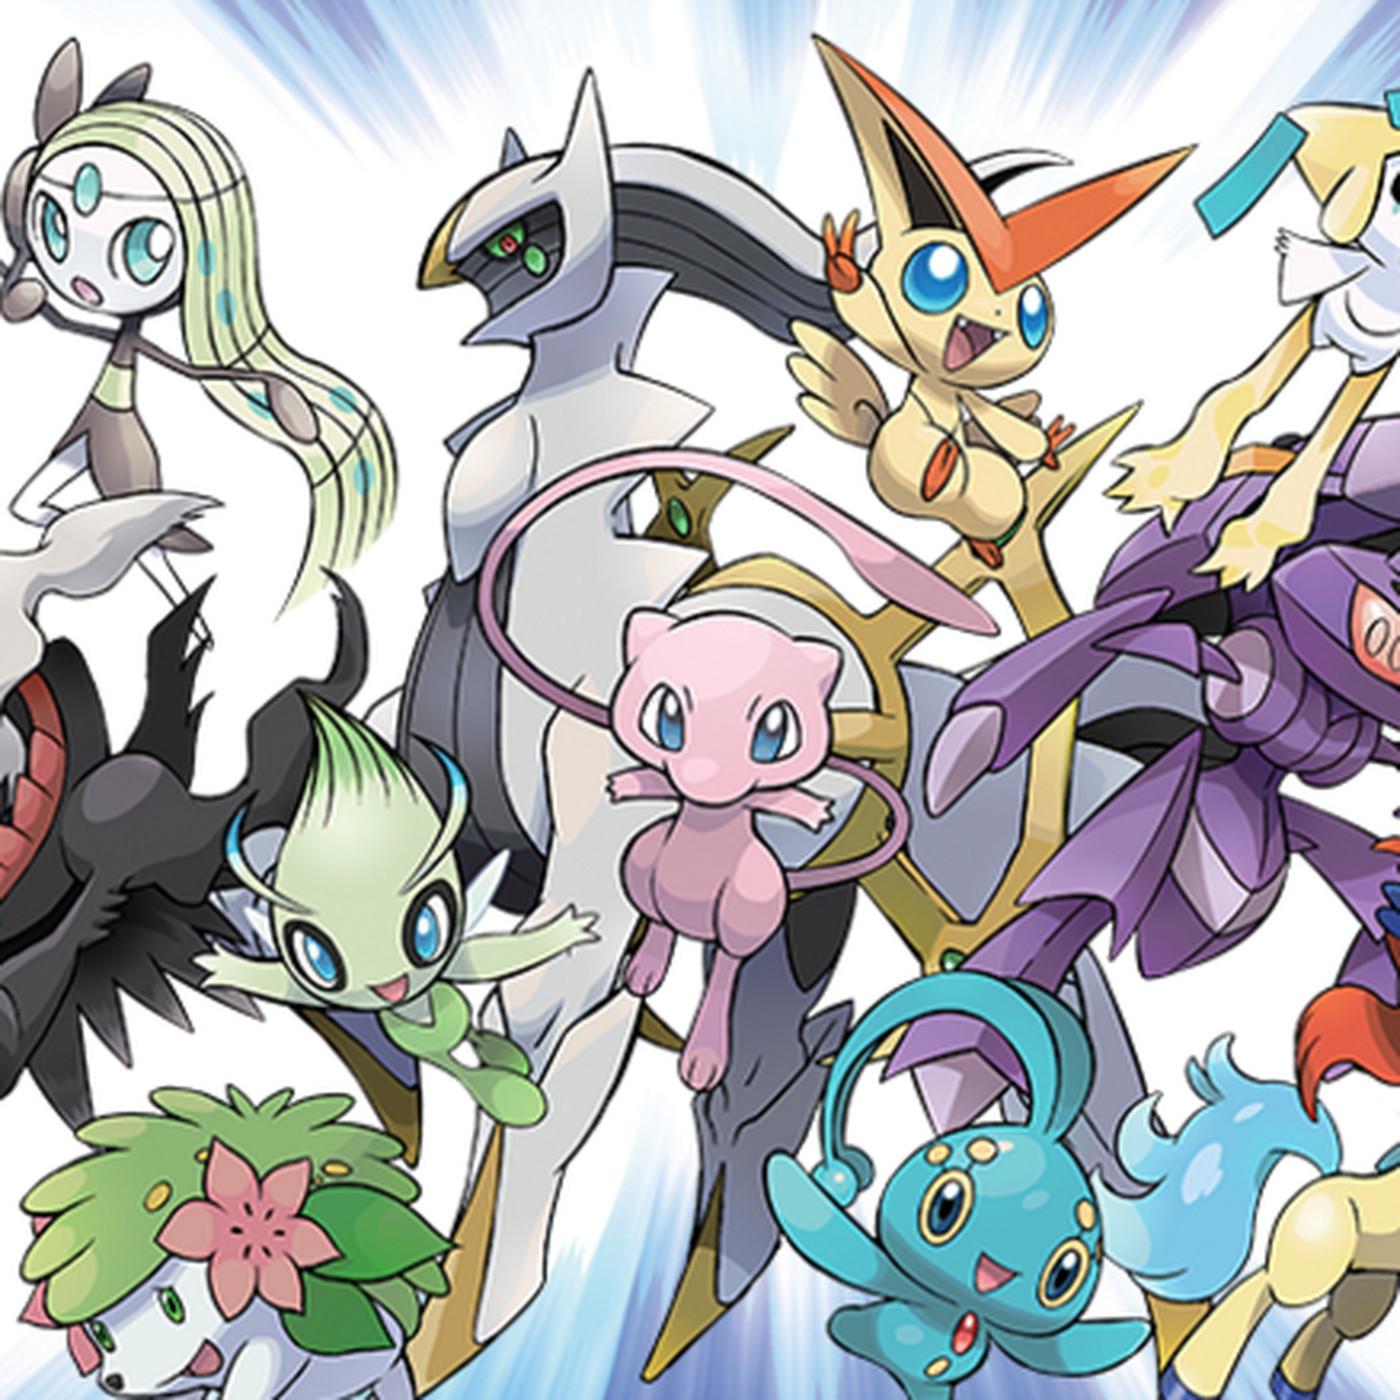 Download Mew and more Pokémon legendaries starting next week